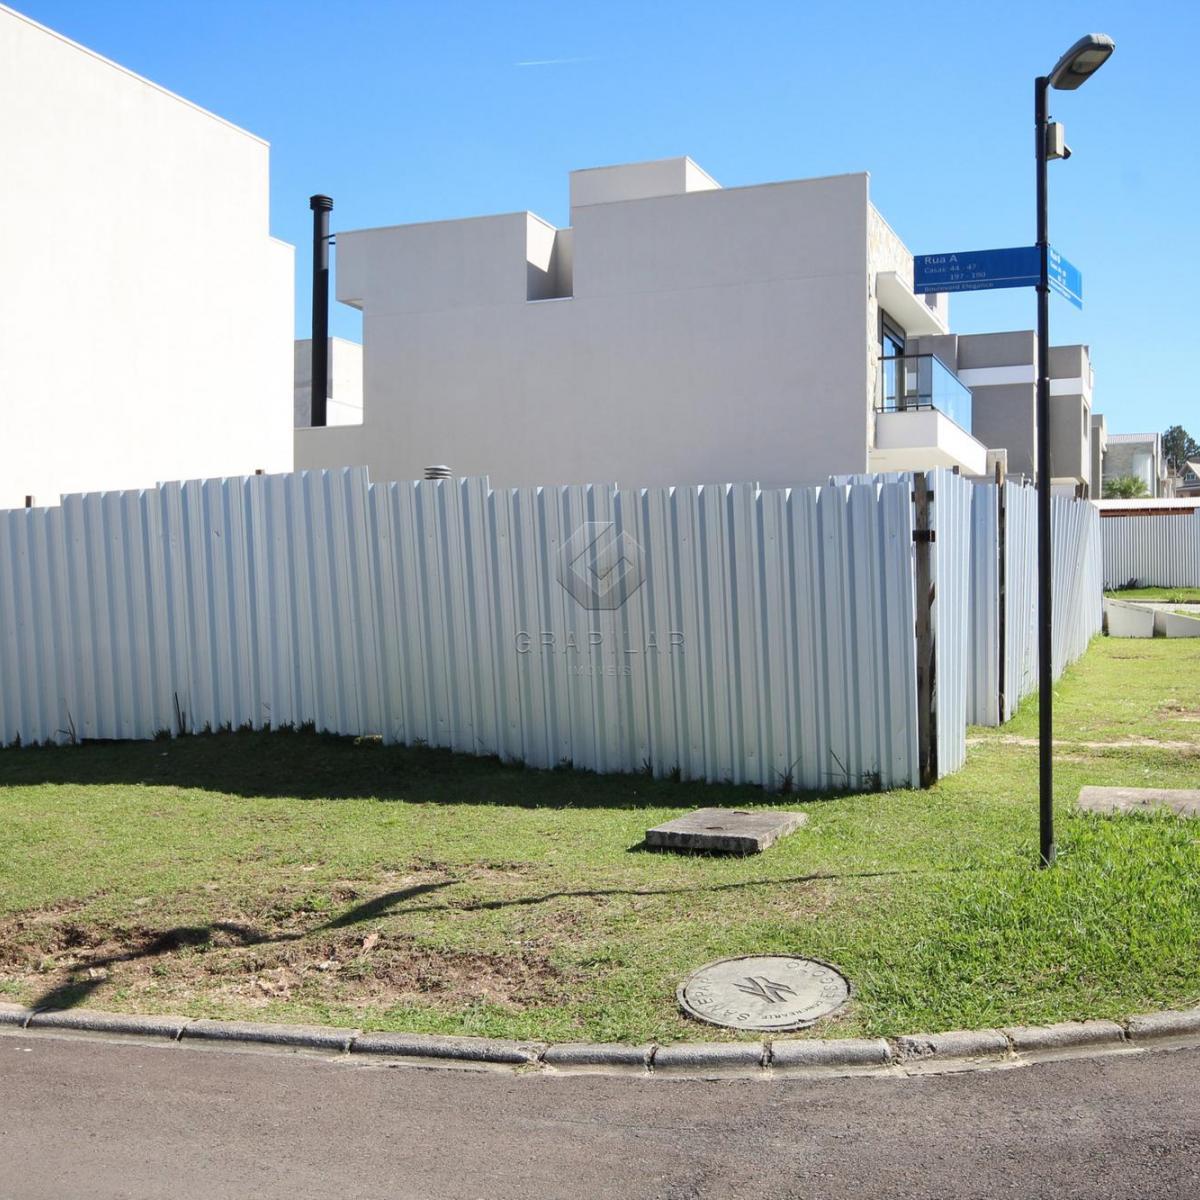 http://www.infocenterhost2.com.br/crm/fotosimovel/541483/114160662-terreno-em-condominio-curitiba-bairro-alto.jpg